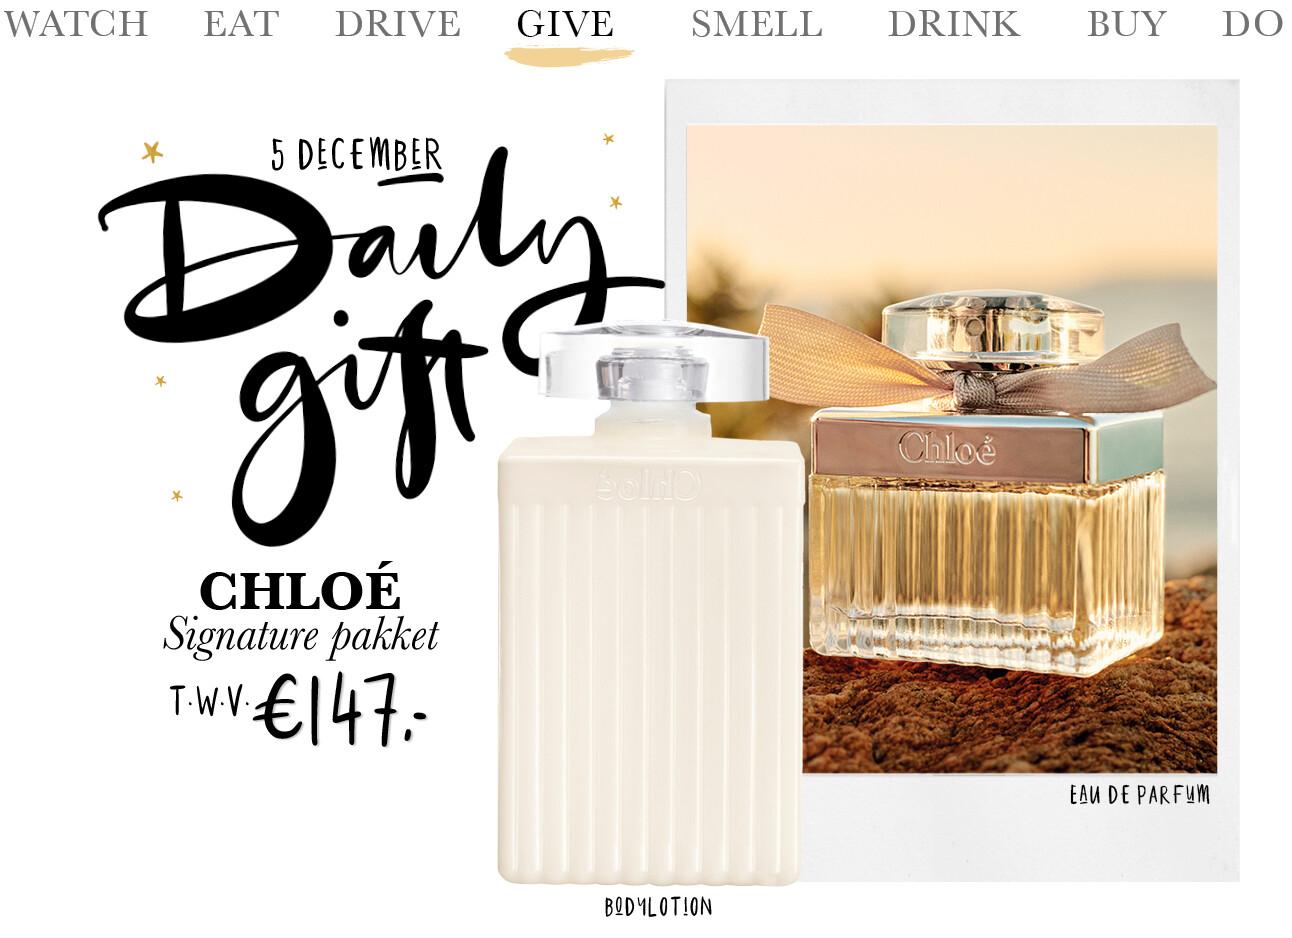 Chloé Signature pakket